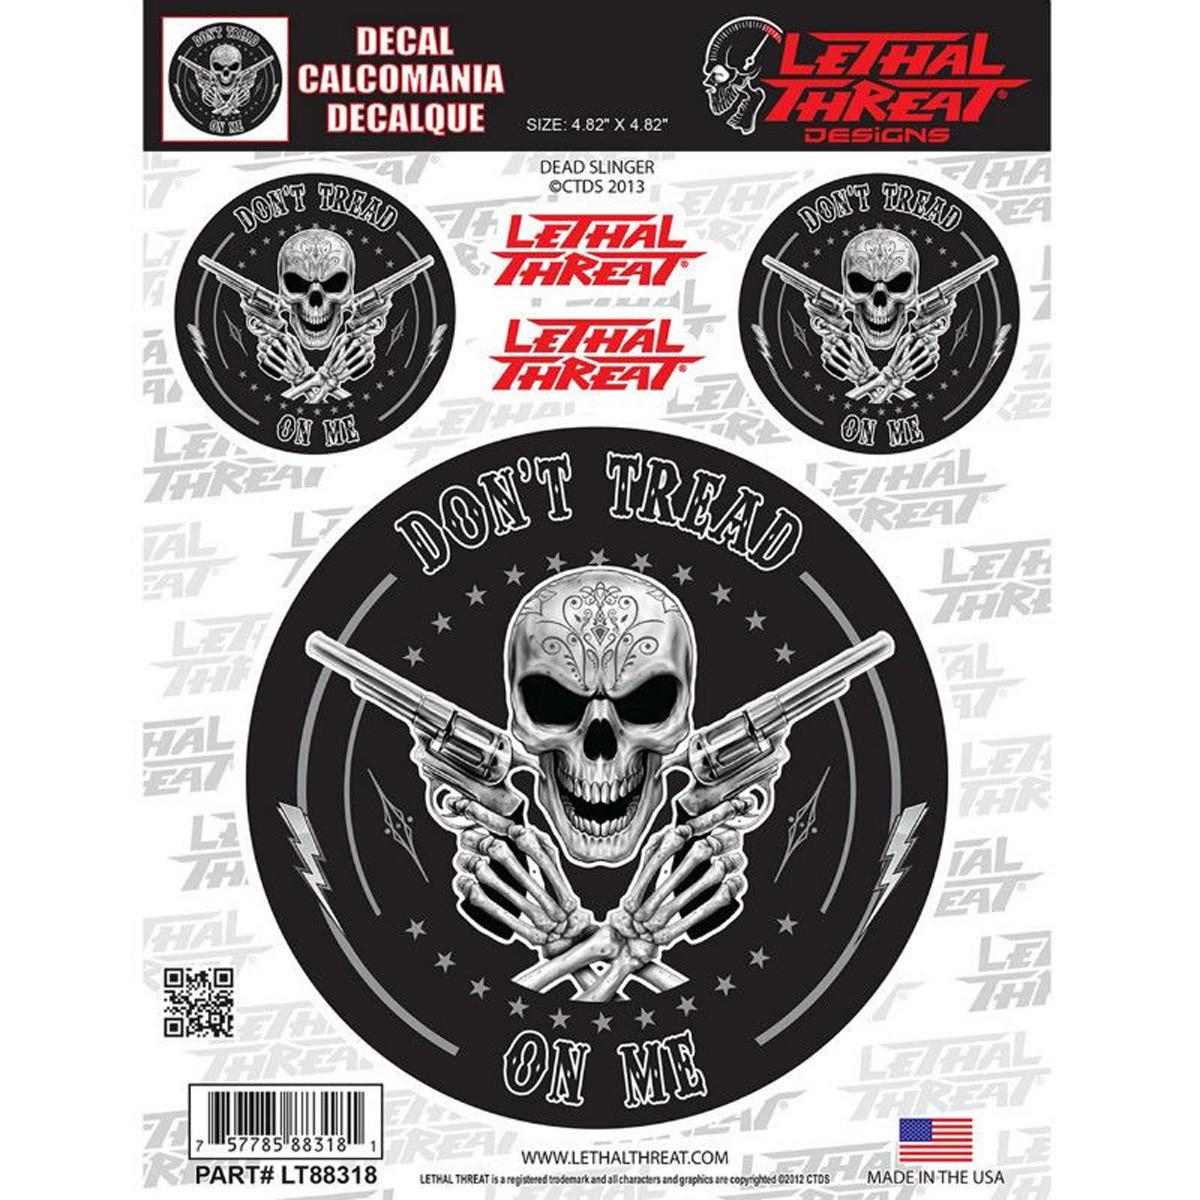 Autocollant / Sticker - LETHAL THREAT Dead Slinger 15 x 20cm